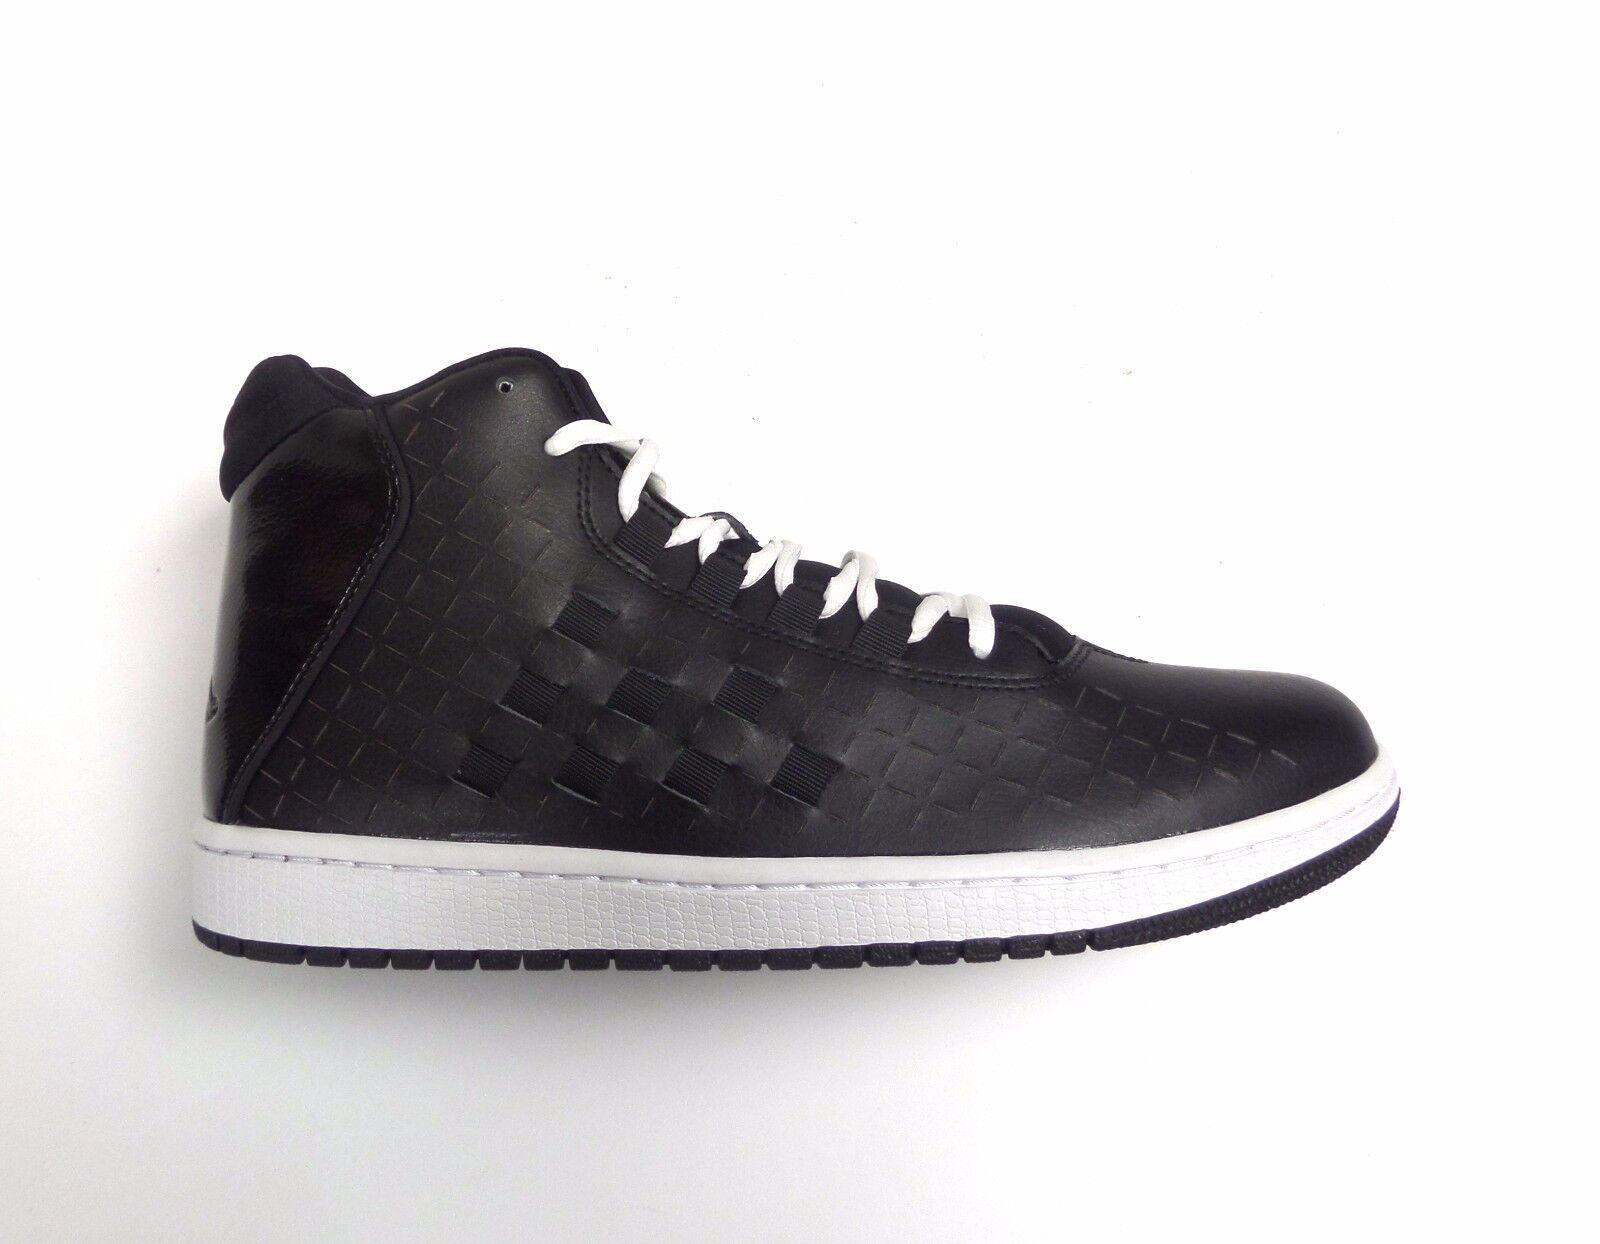 best-selling model of the brand Nike Men's Air Jordan ILLUSION Shoes Black/White 705141-010 a1